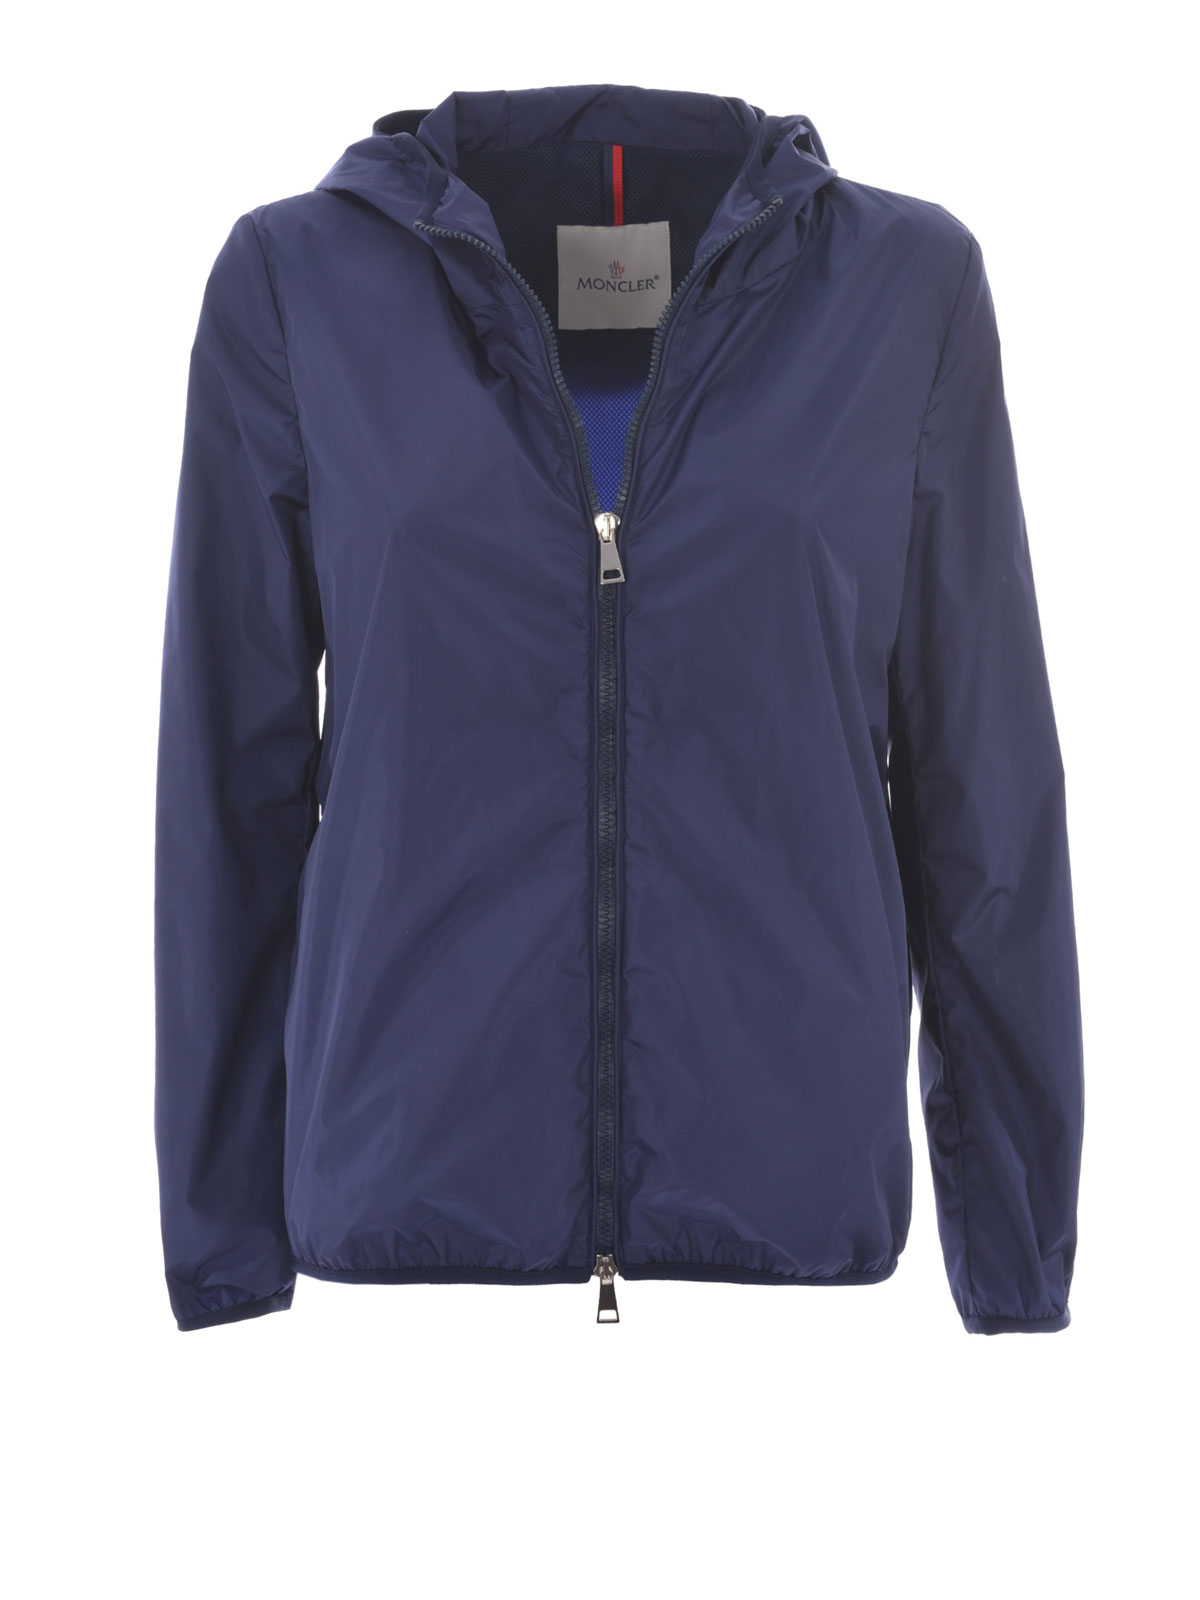 moncler vive zip jacket